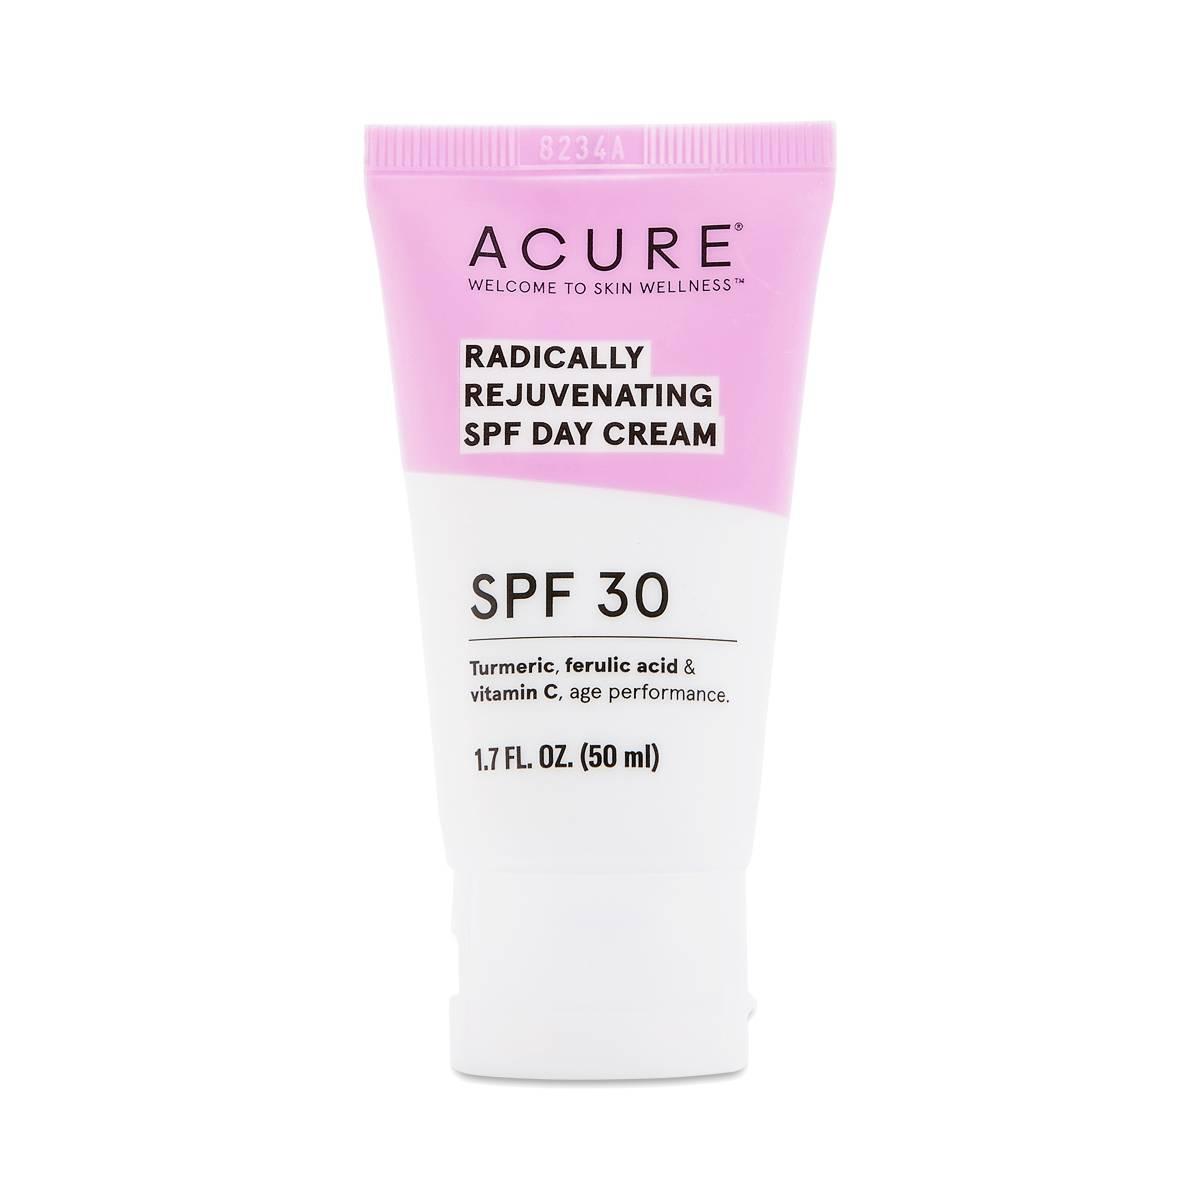 ACURE Radically Rejuvenating SPF 30 Day Cream